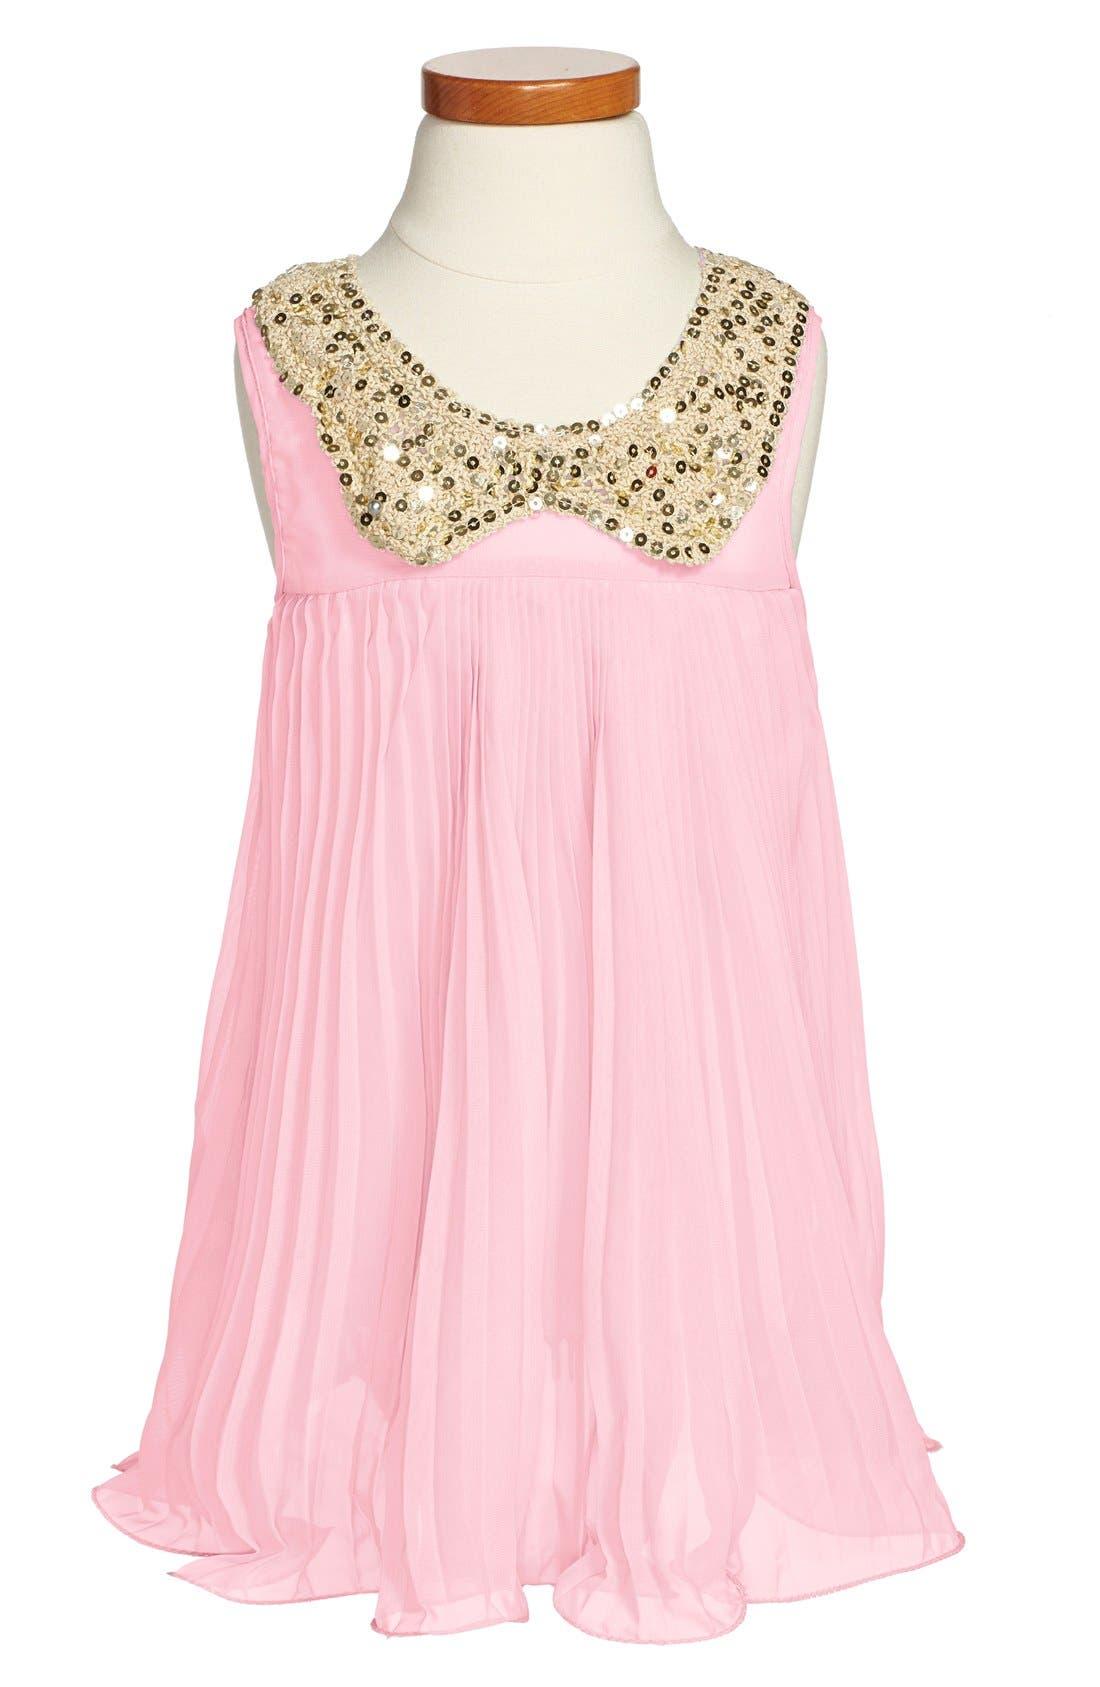 Main Image - Popatu Pleated Sleeveless Dress (Toddler Girls & Little Girls)